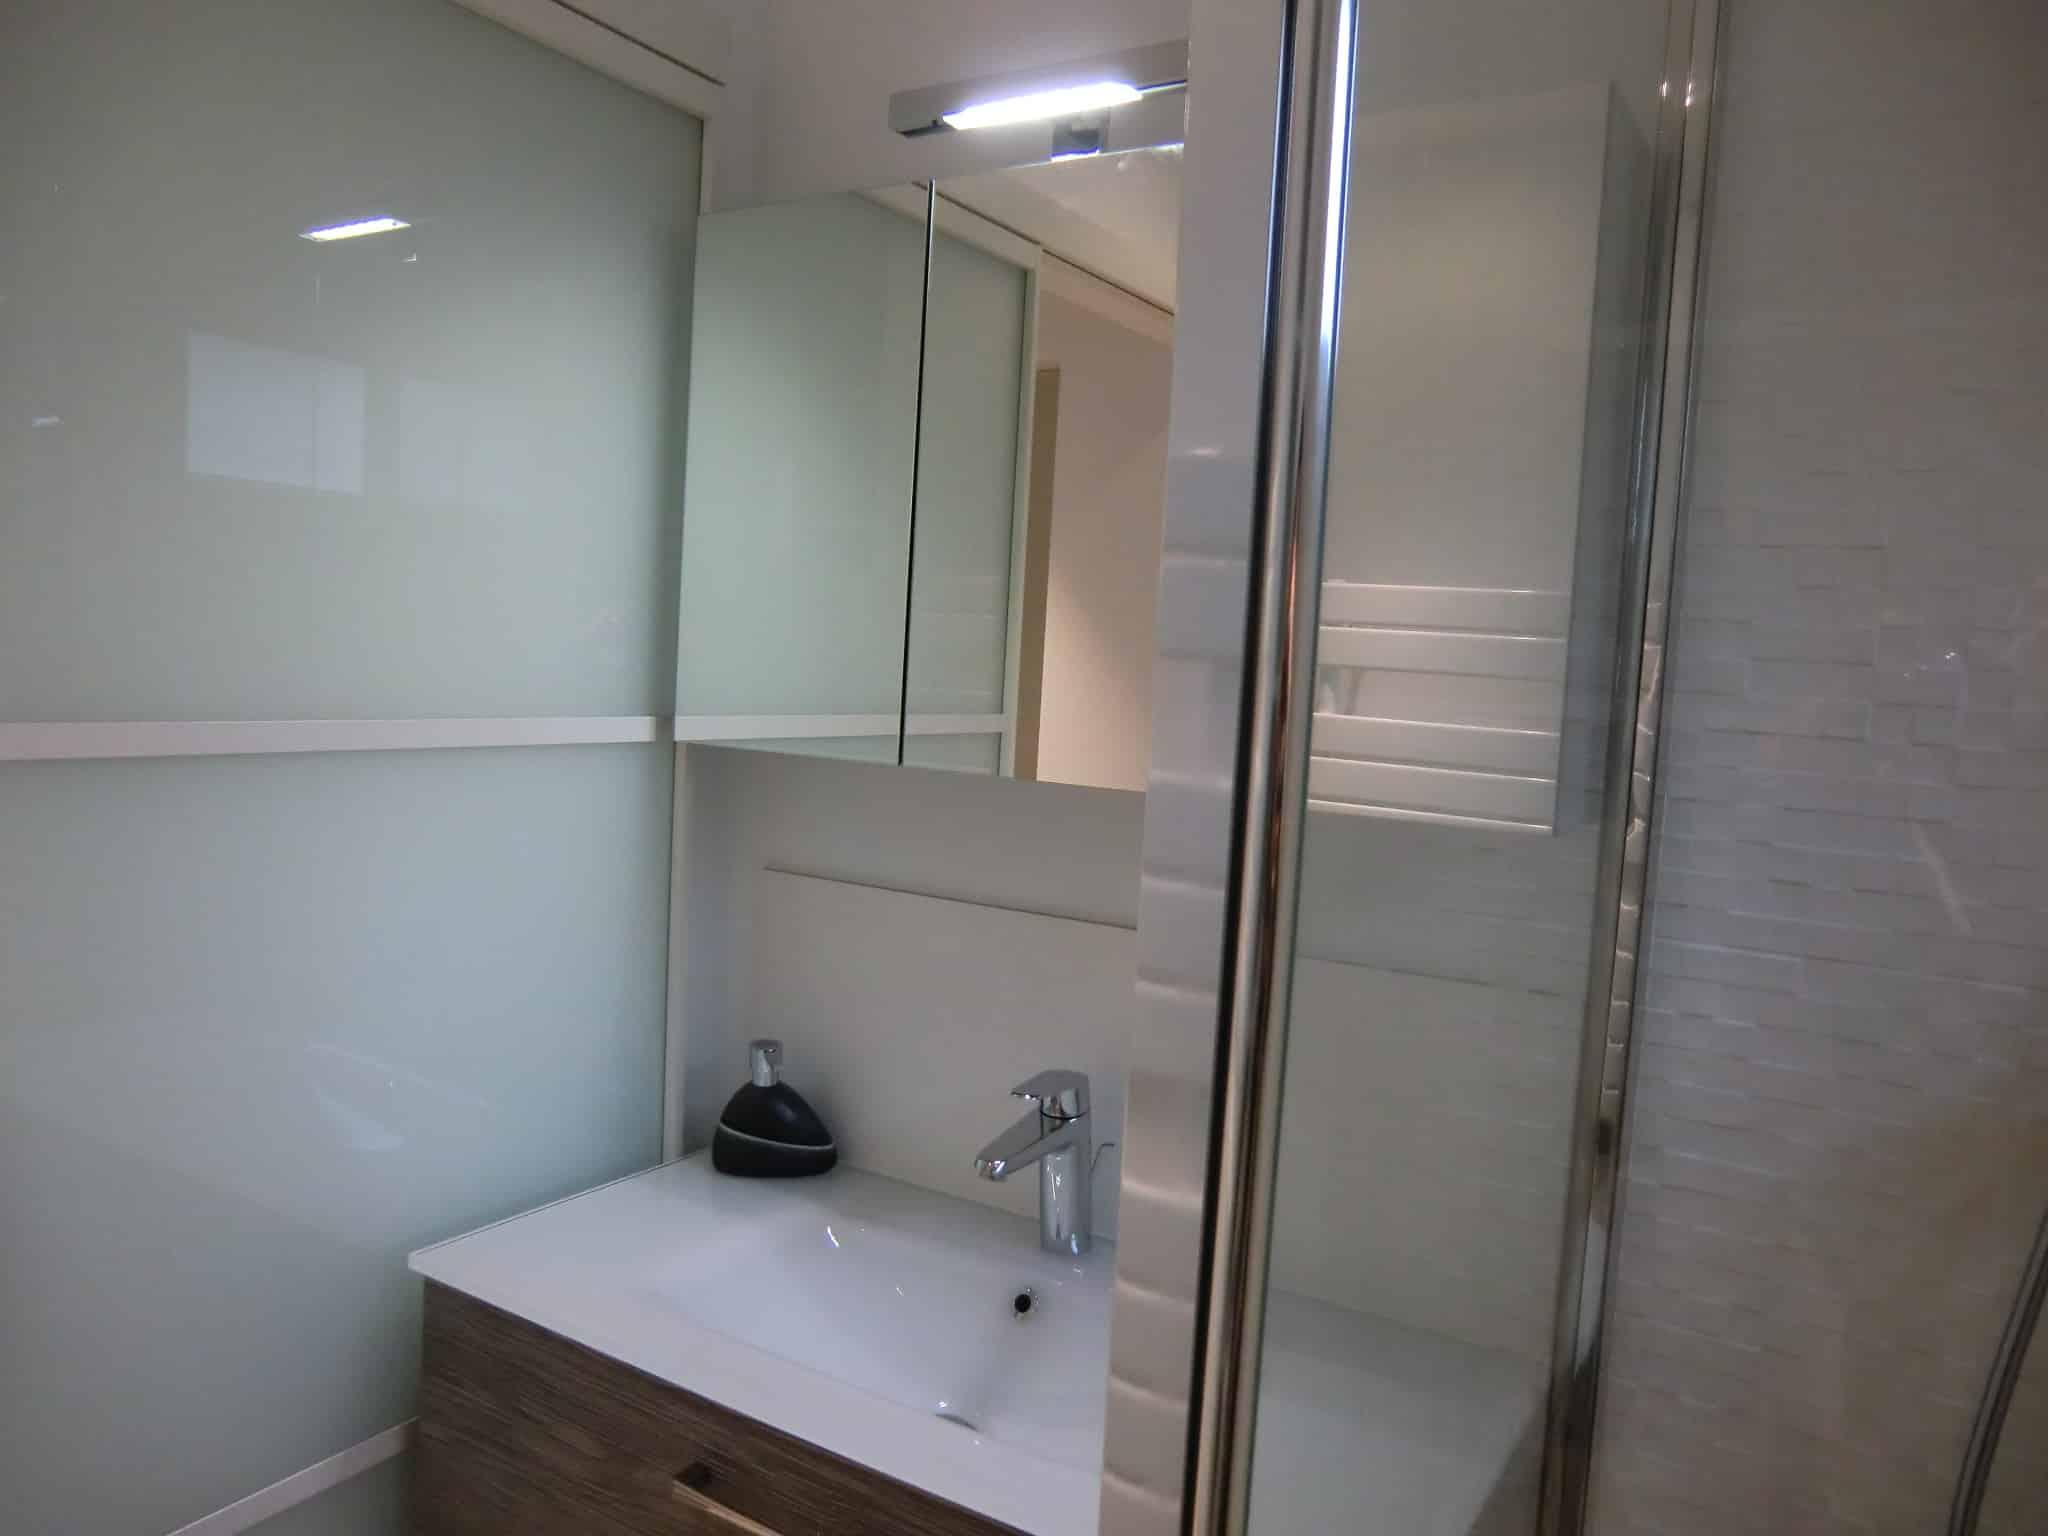 Appartement montpellier 70m for Salle de bain annee 70